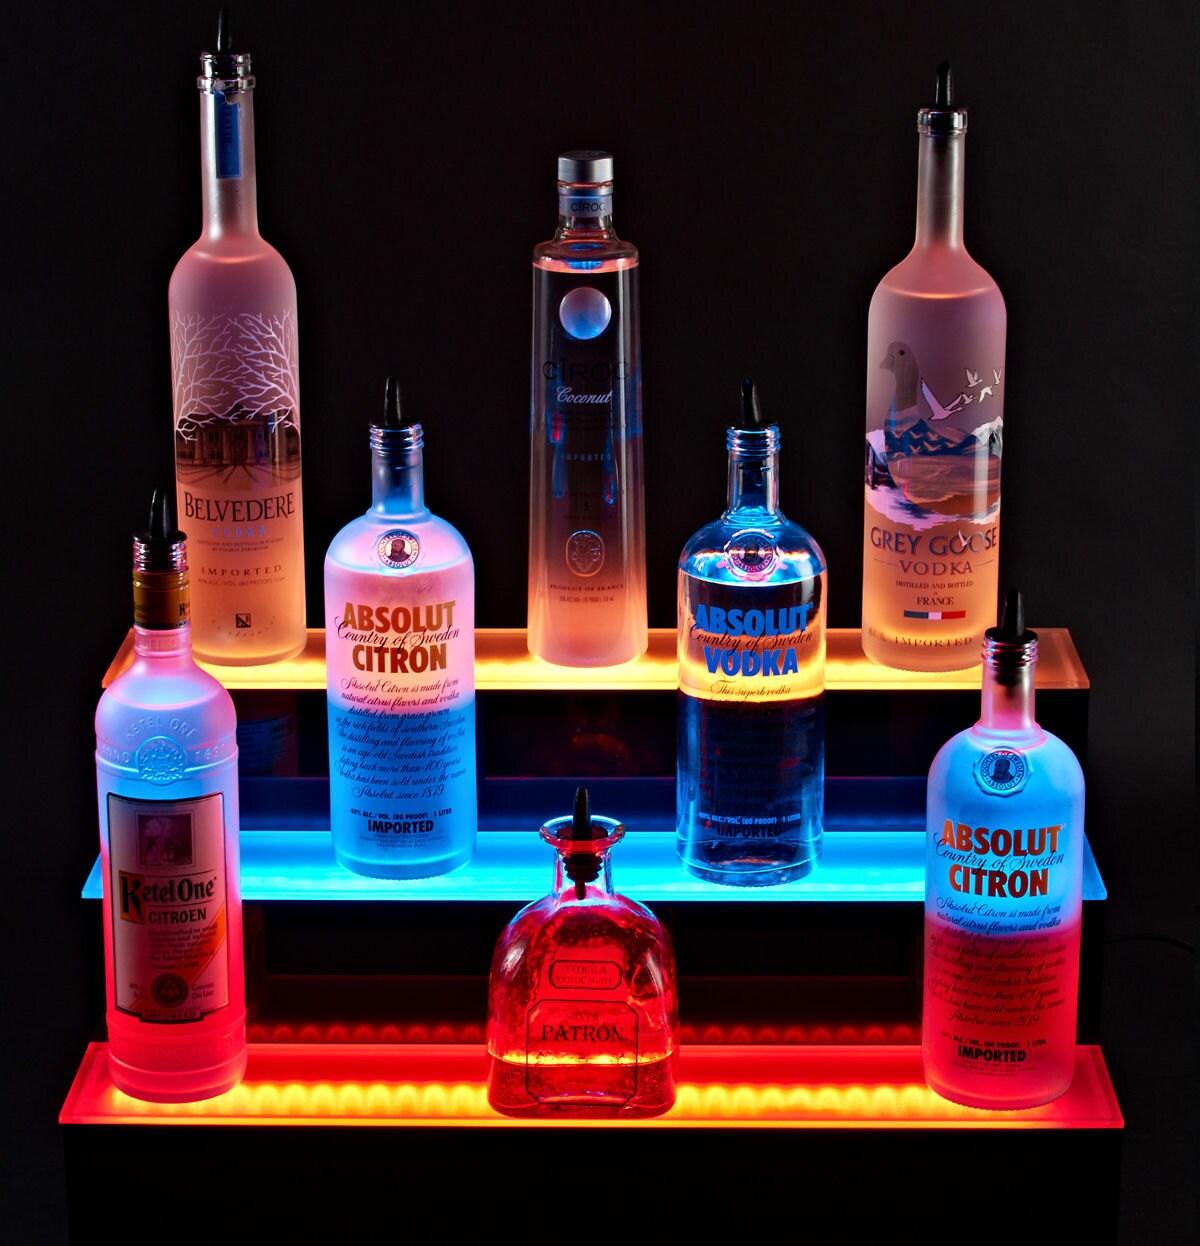 Armana Acrylic 57 Wall Mount LED Lighted Liquor Bottle Shelf 4 9